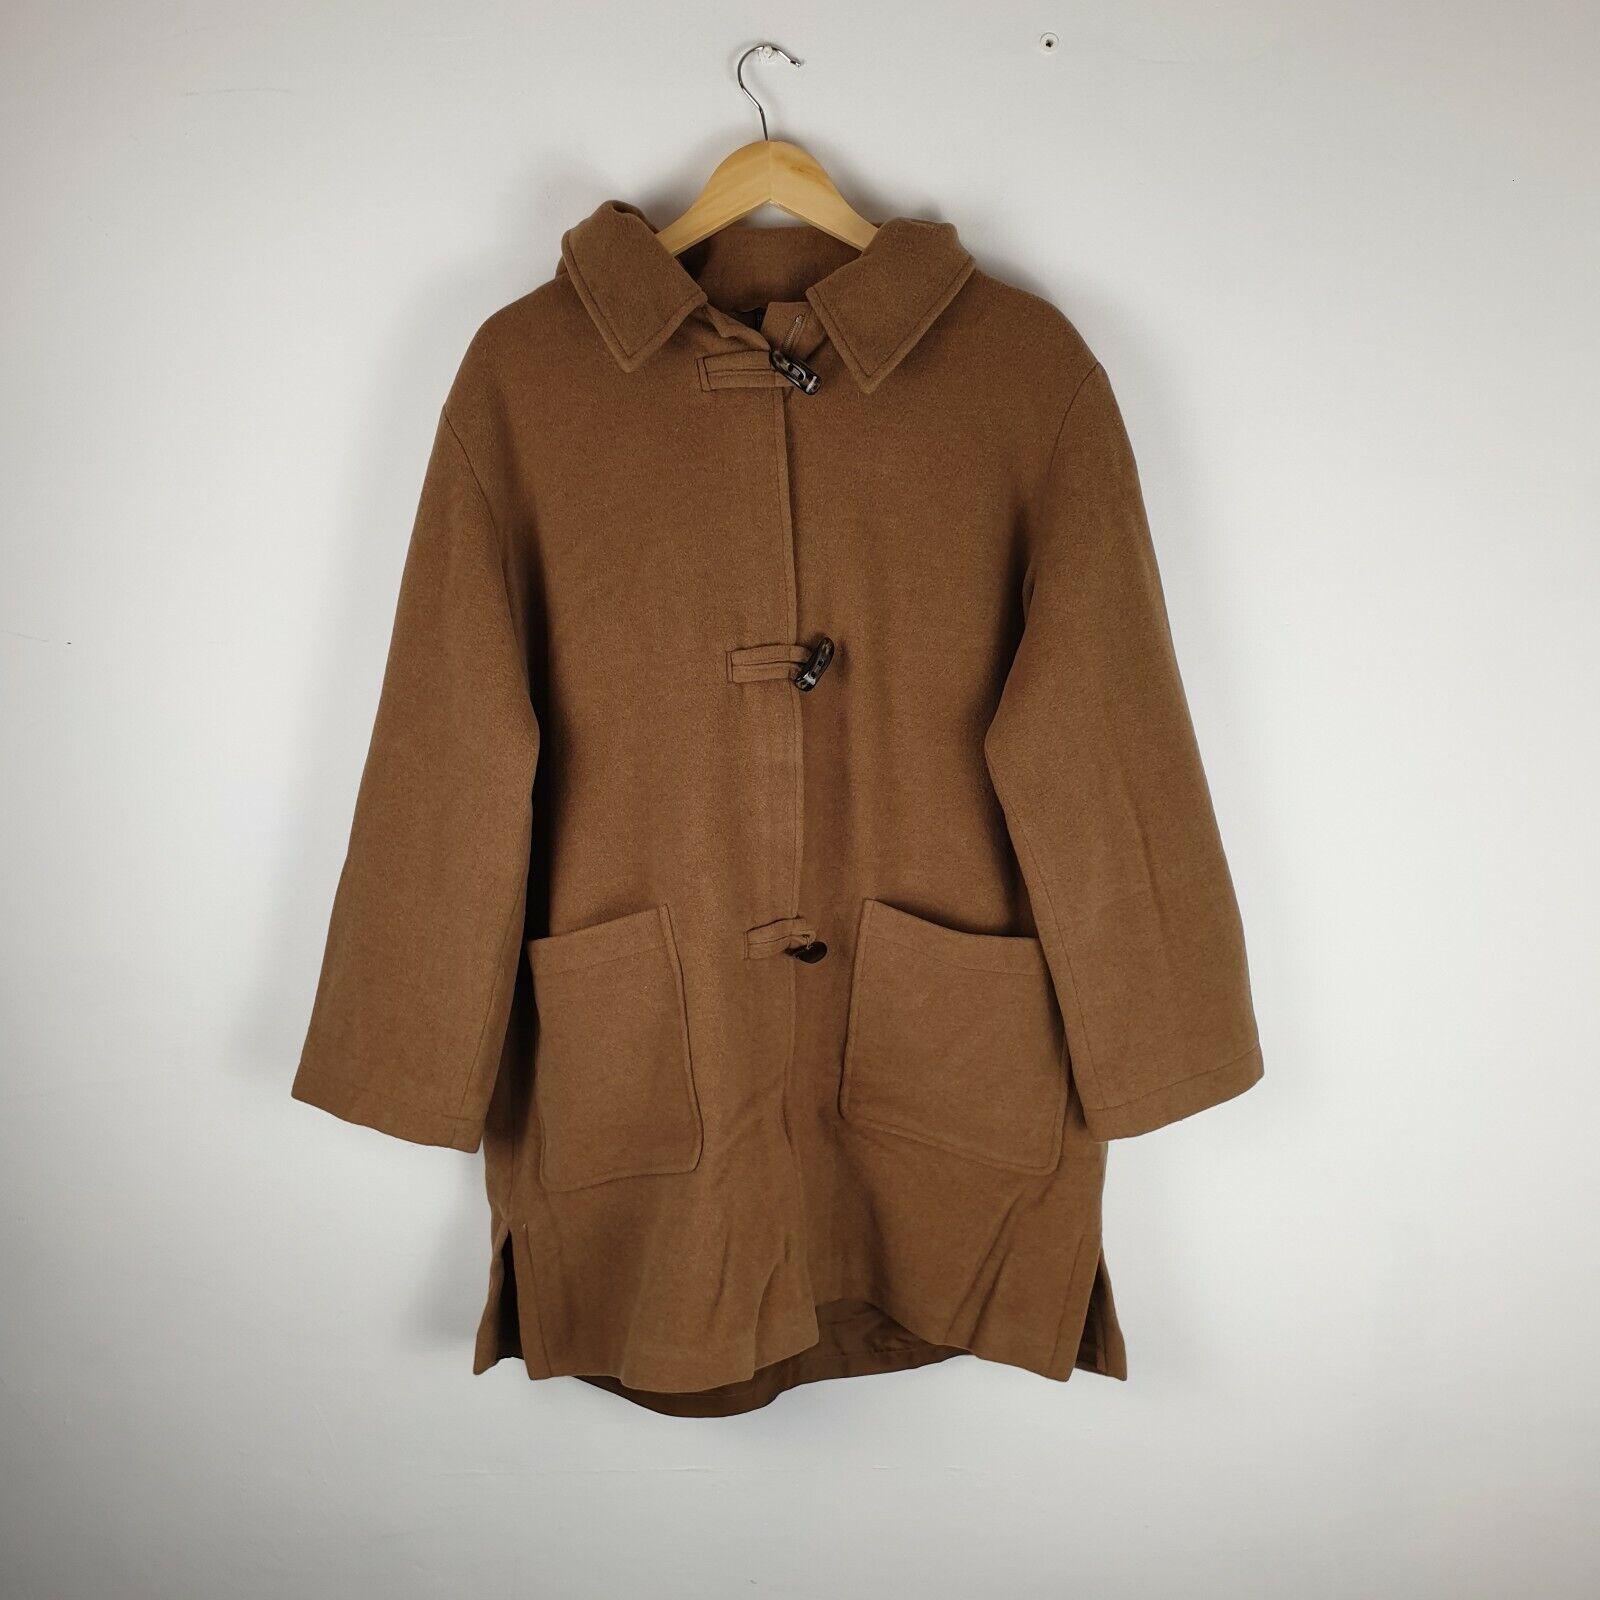 Women's Berghaus Fashion Brown Woollen Jacket Trench Coat Long Length Size 18